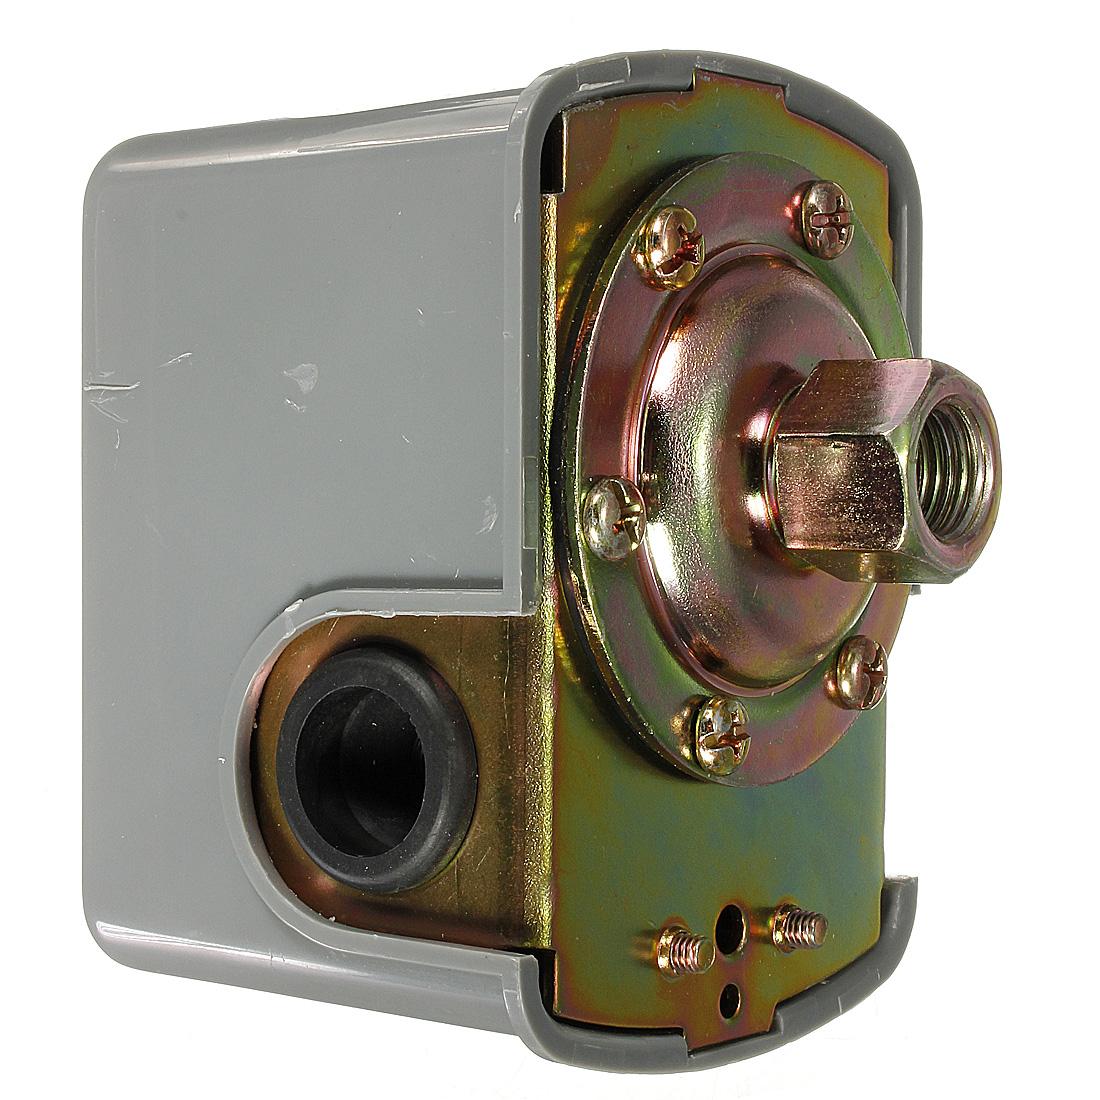 water well pump tank pressure control switch 40 60 psi adjustable ebay. Black Bedroom Furniture Sets. Home Design Ideas